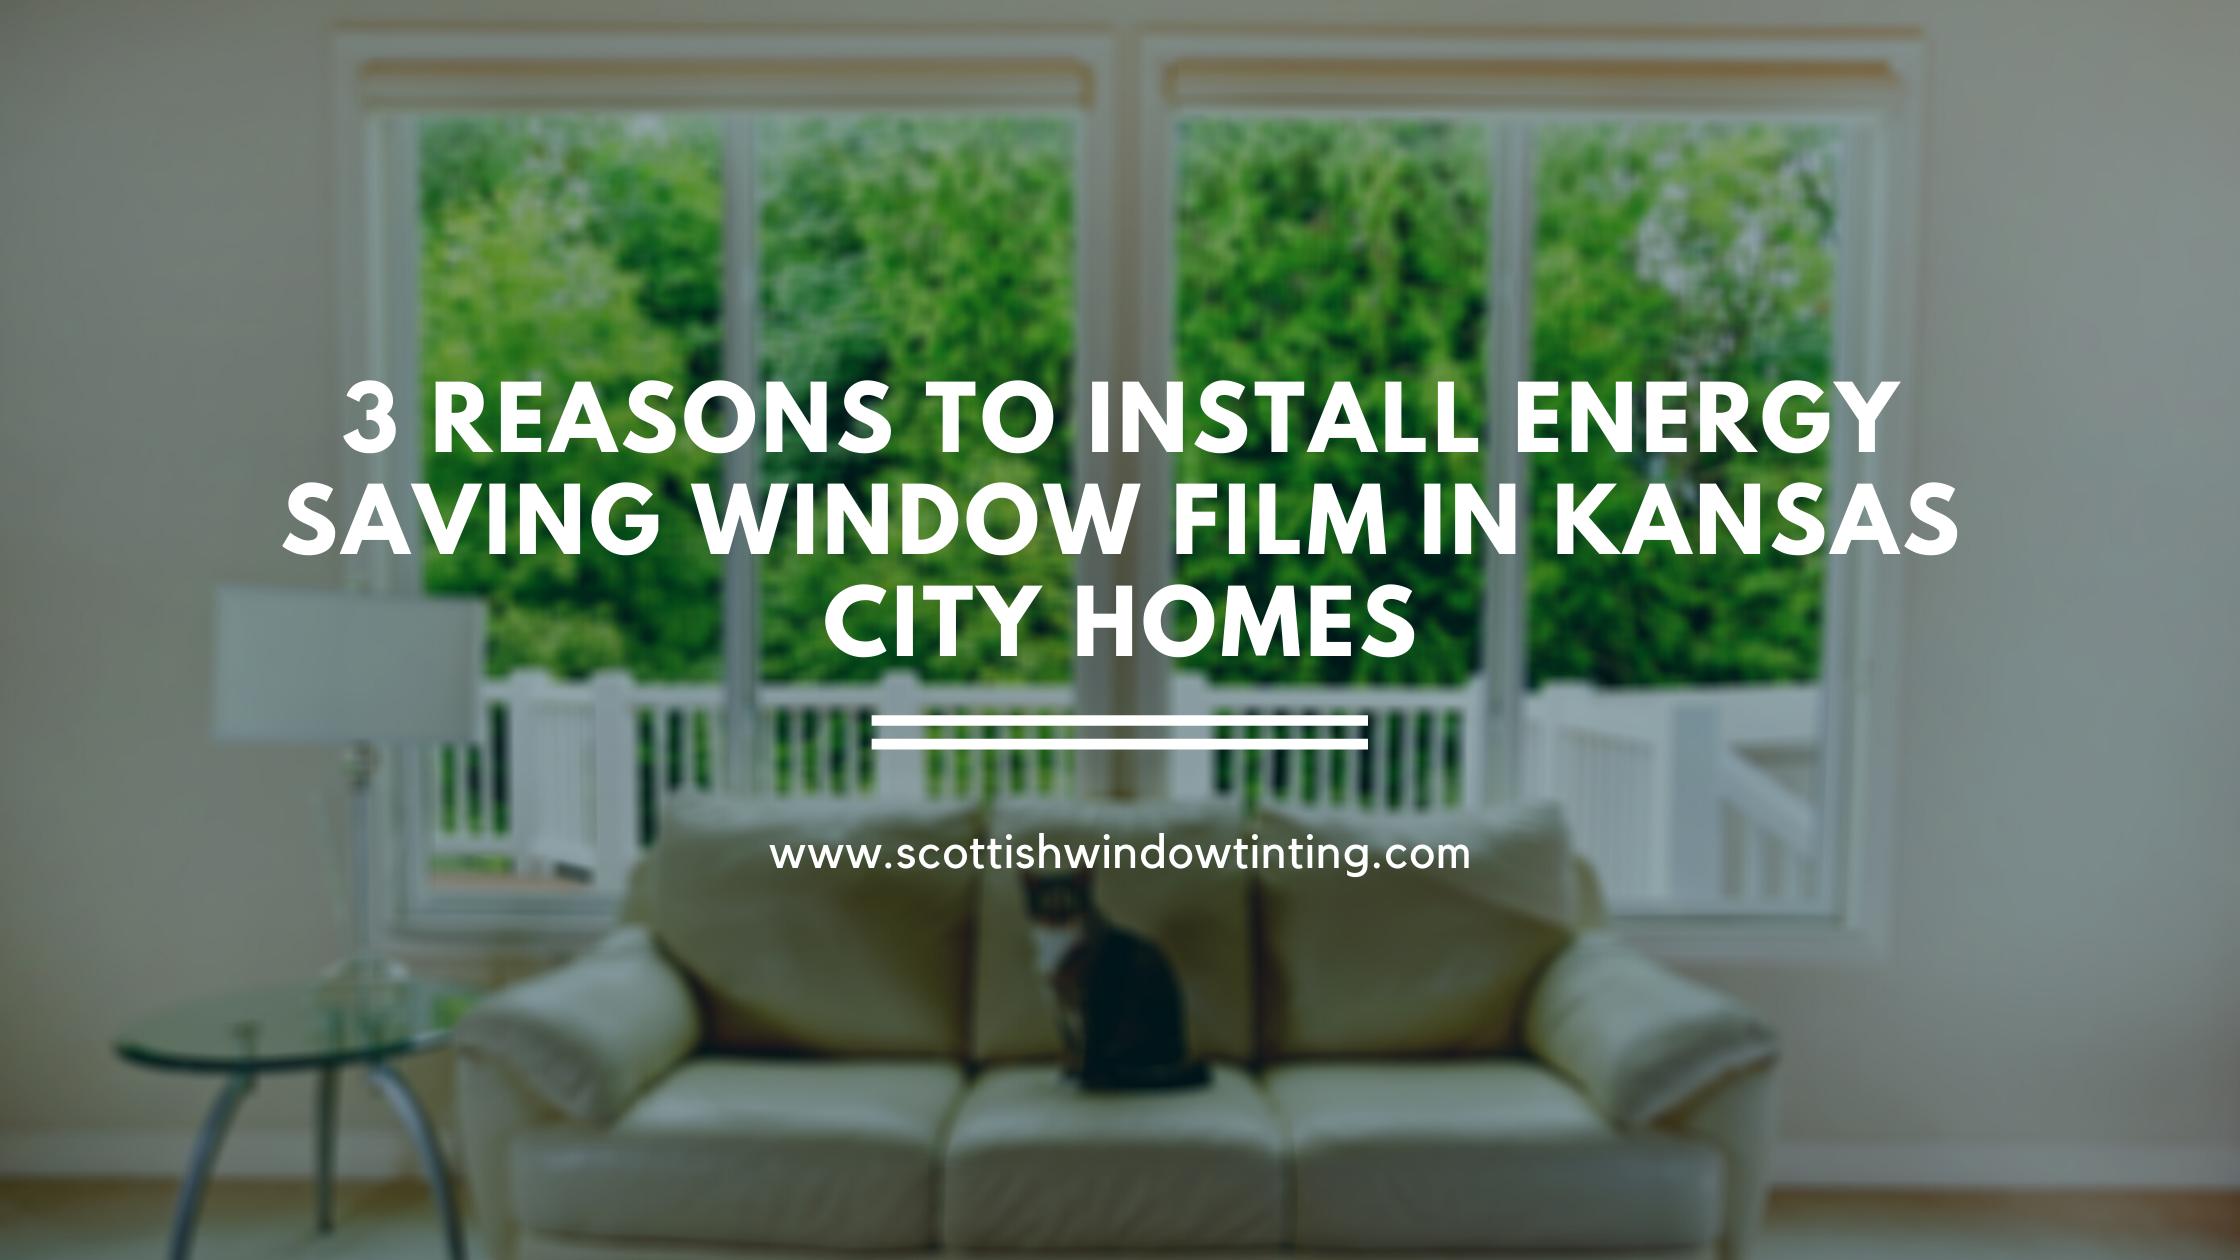 3 Reasons to Install Energy Saving Window Film in Kansas City Homes